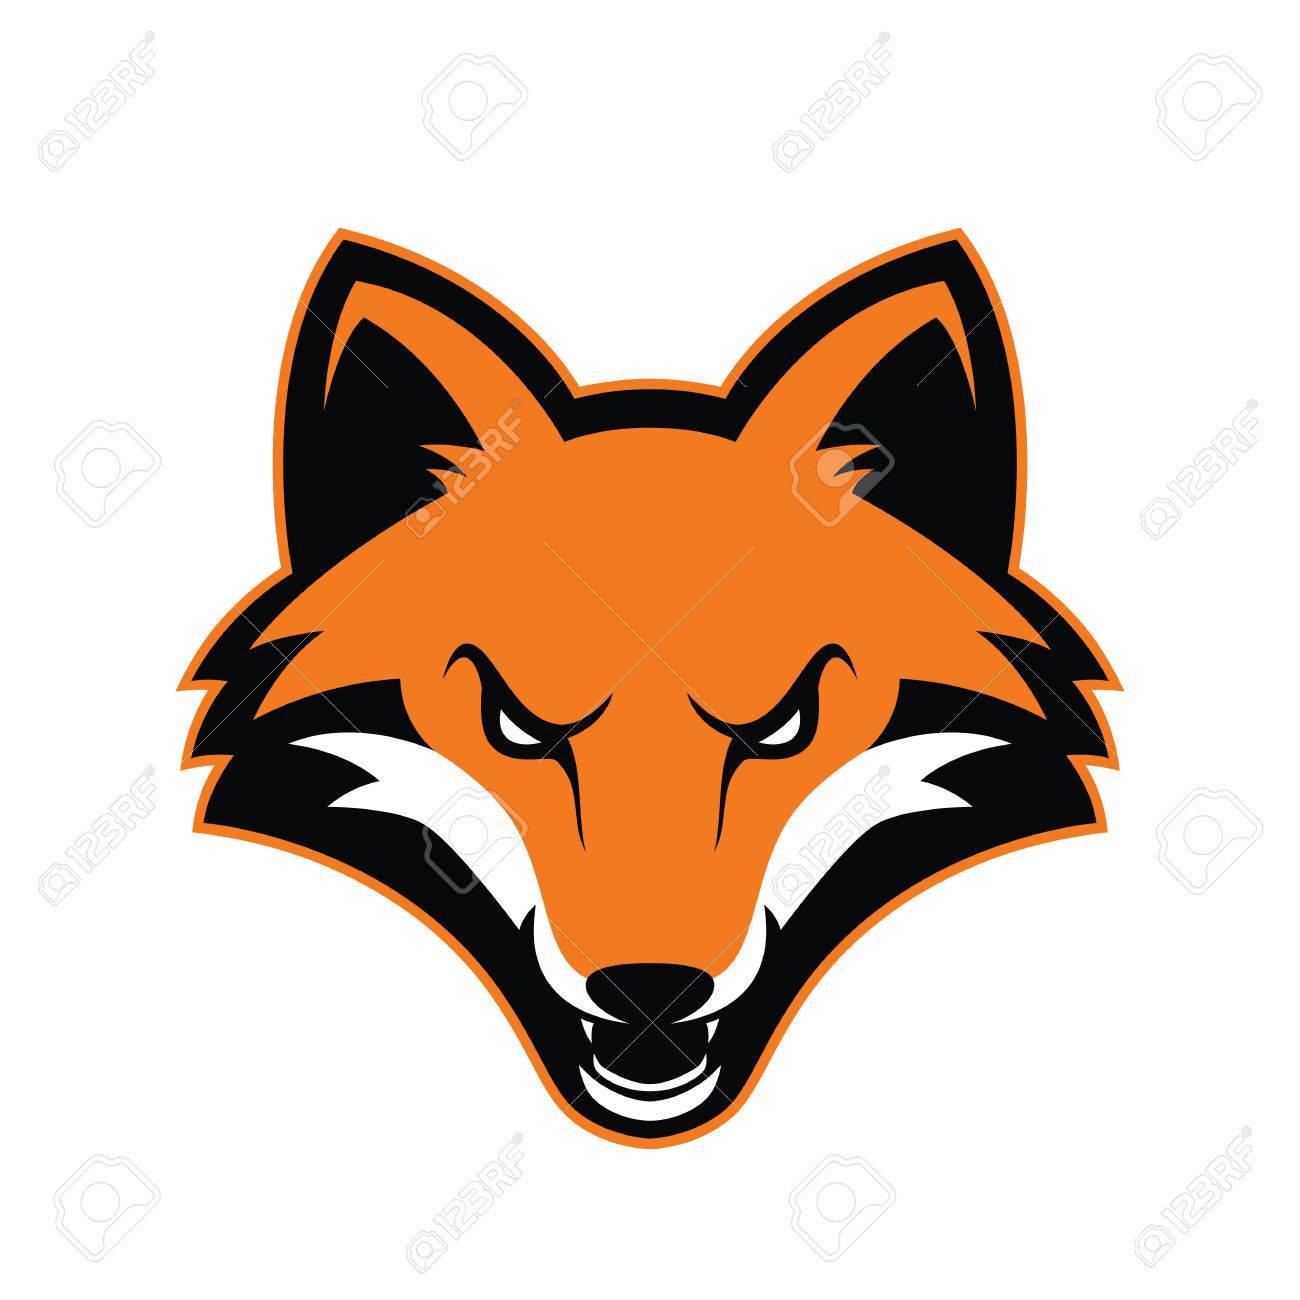 Fox Head Mascot Royalty Free Cliparts Vectors And Stock Illustration Image 83784042